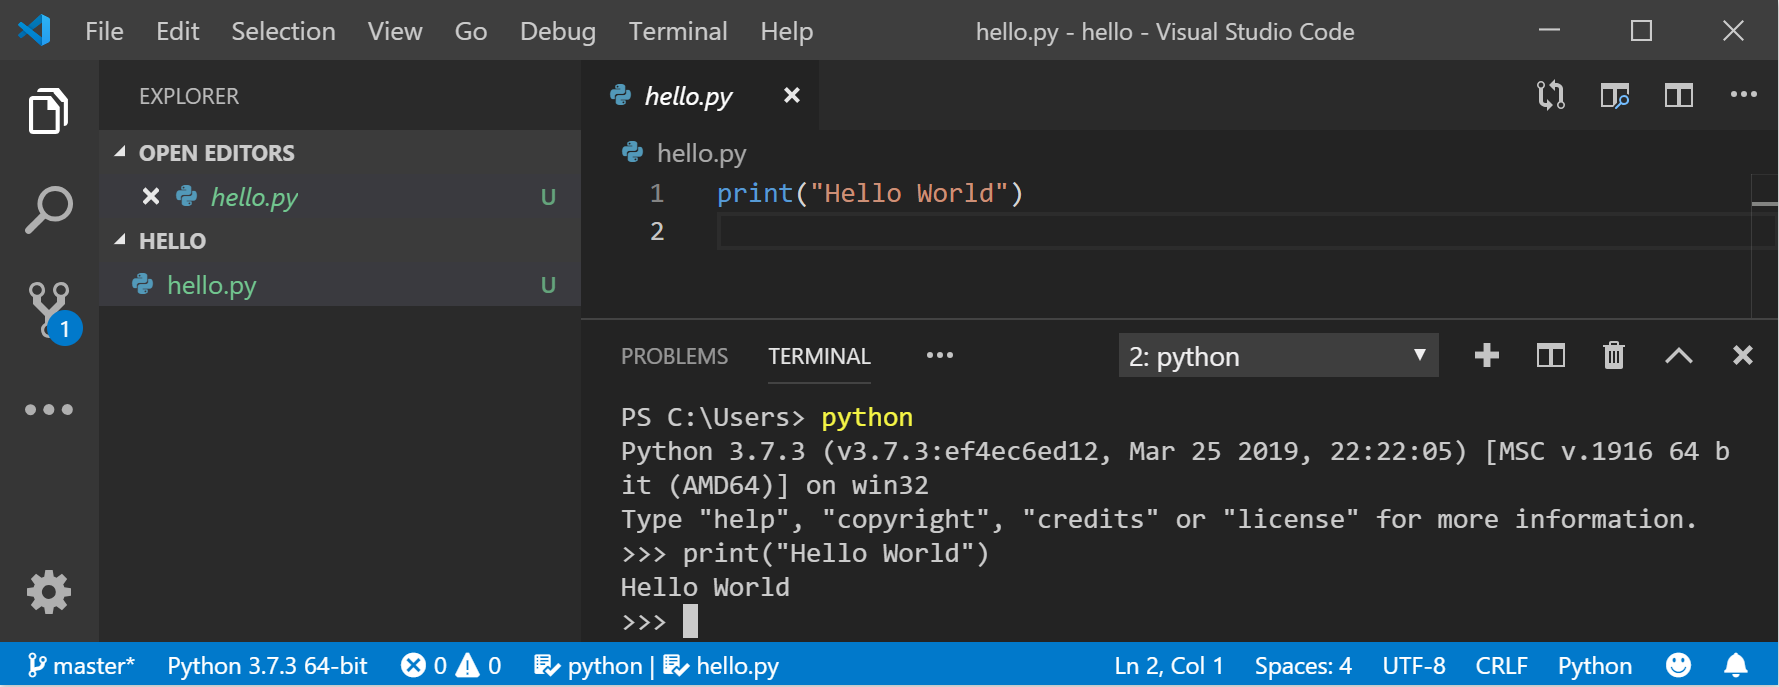 VS Code 中的 Python 命令行